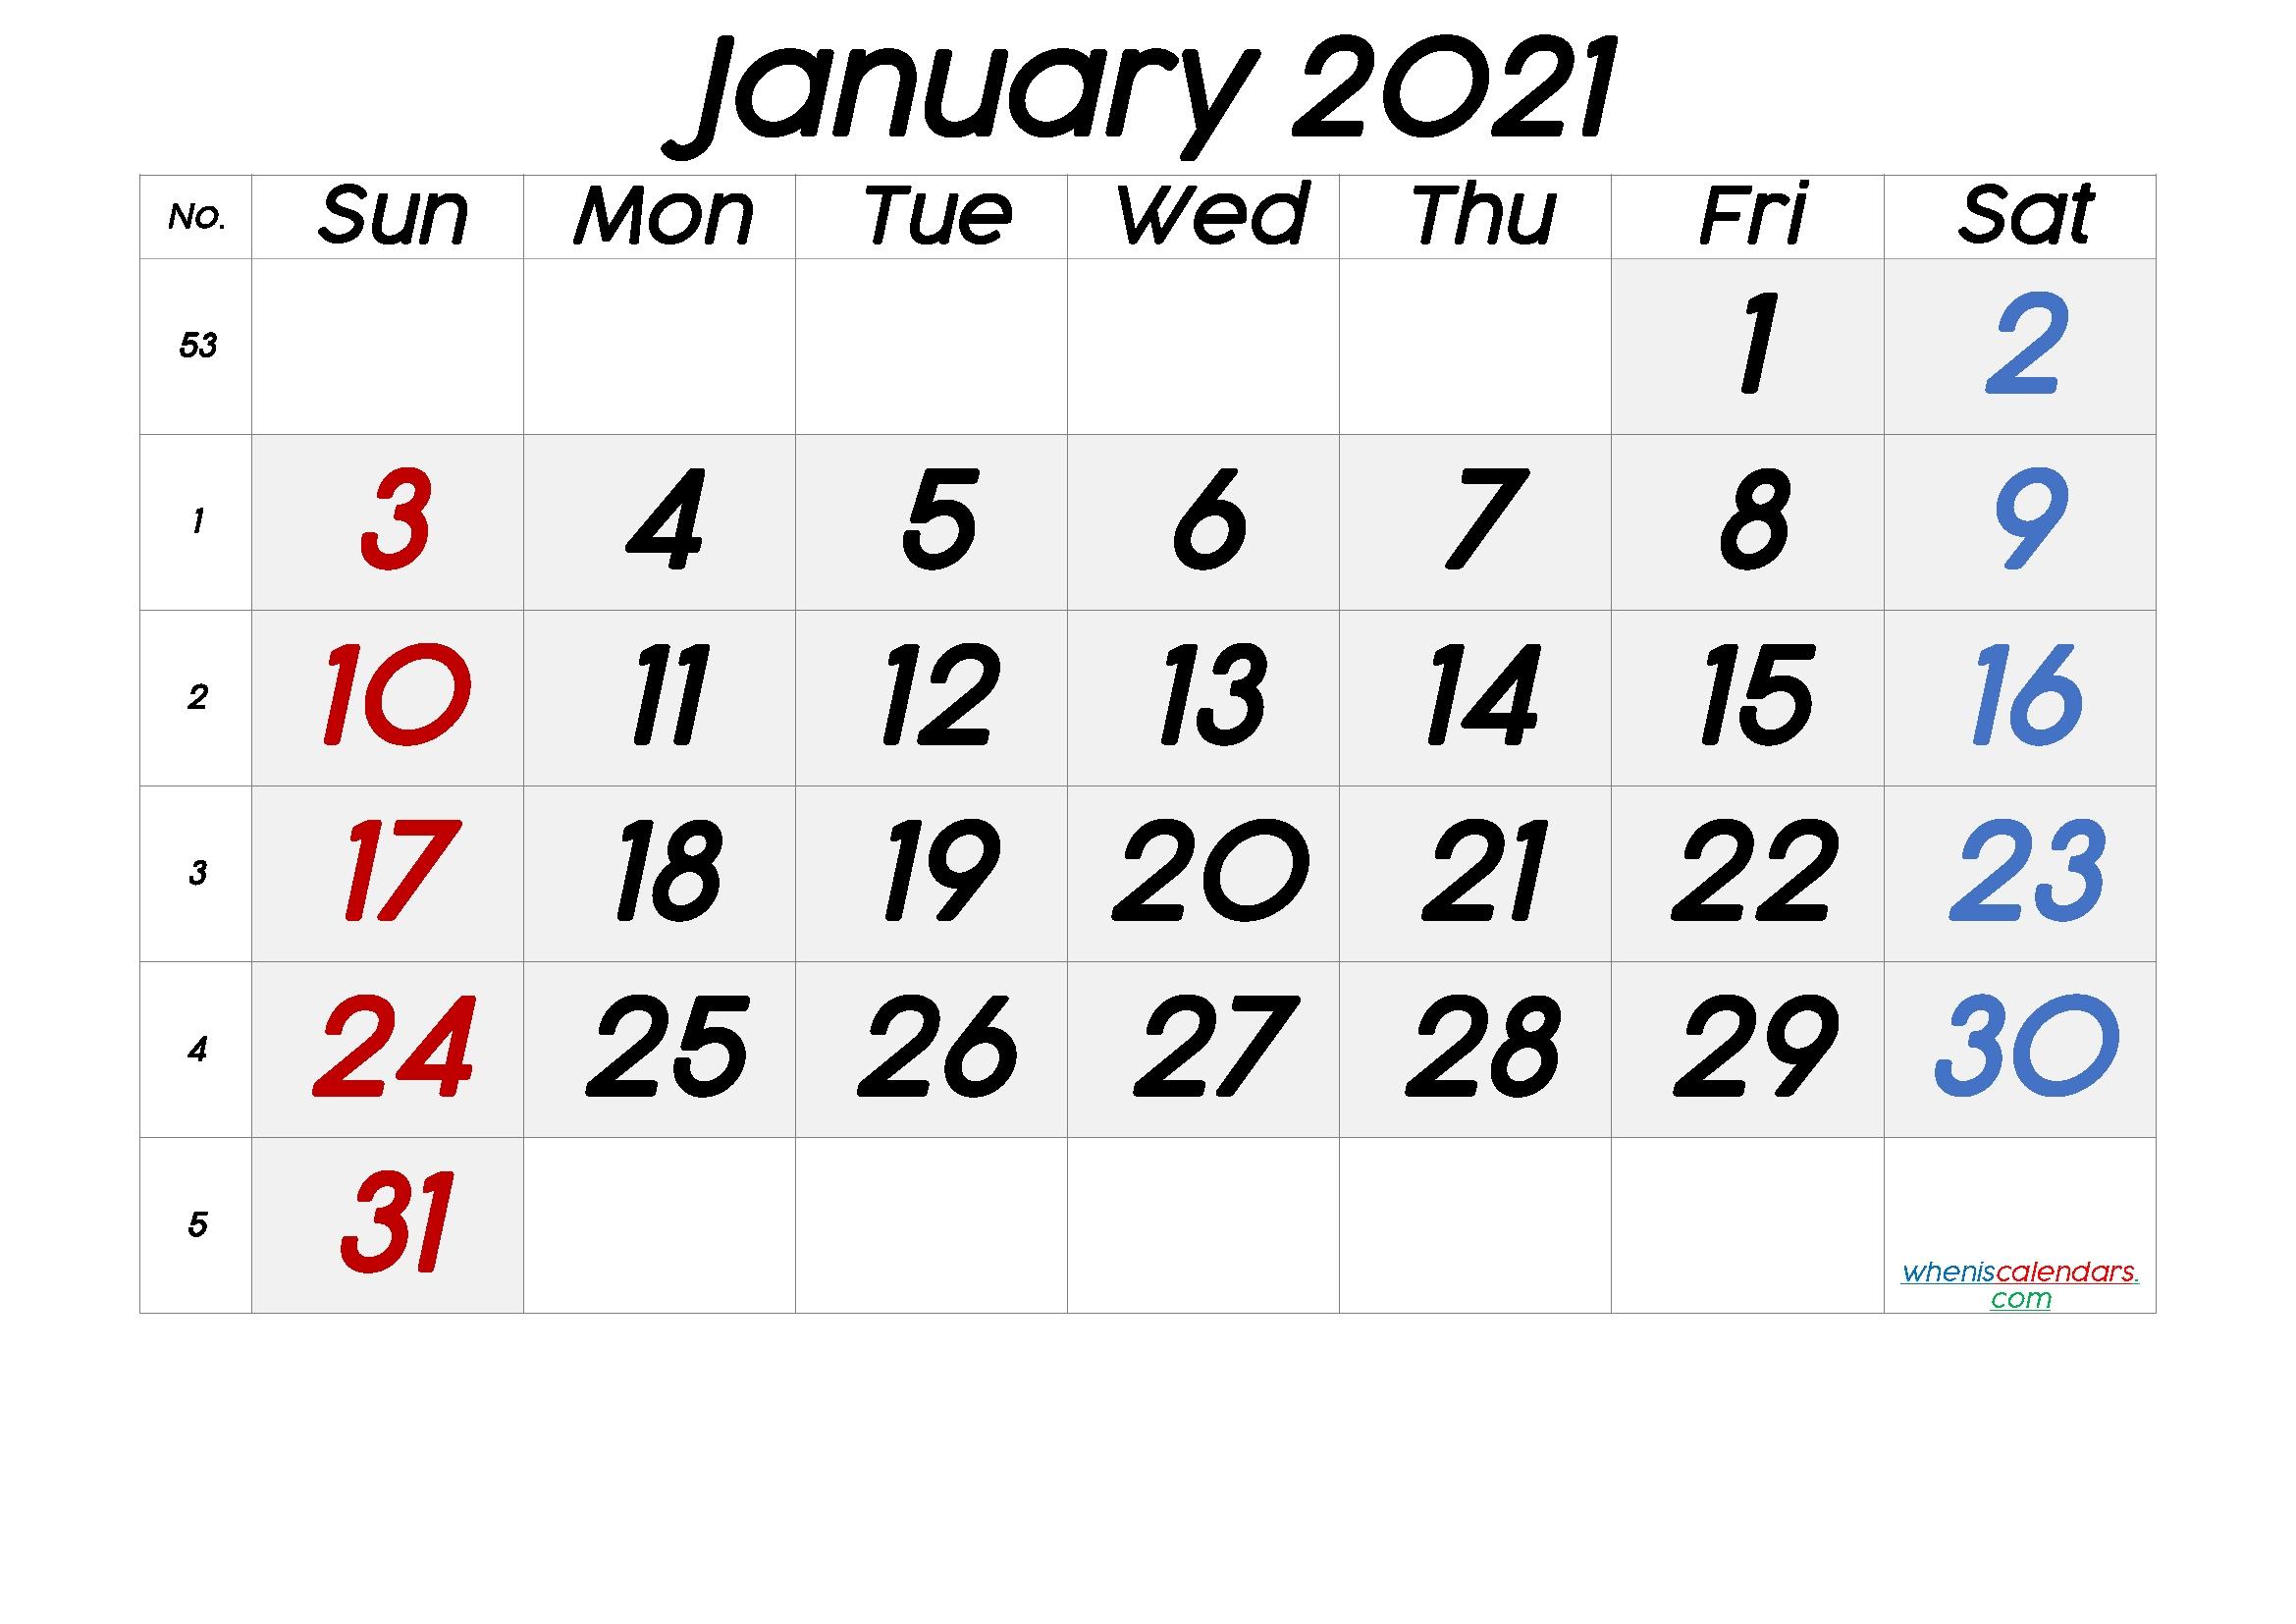 Free Printable January 2021 Calendar-4X6 Free Printables 2021 Calendars